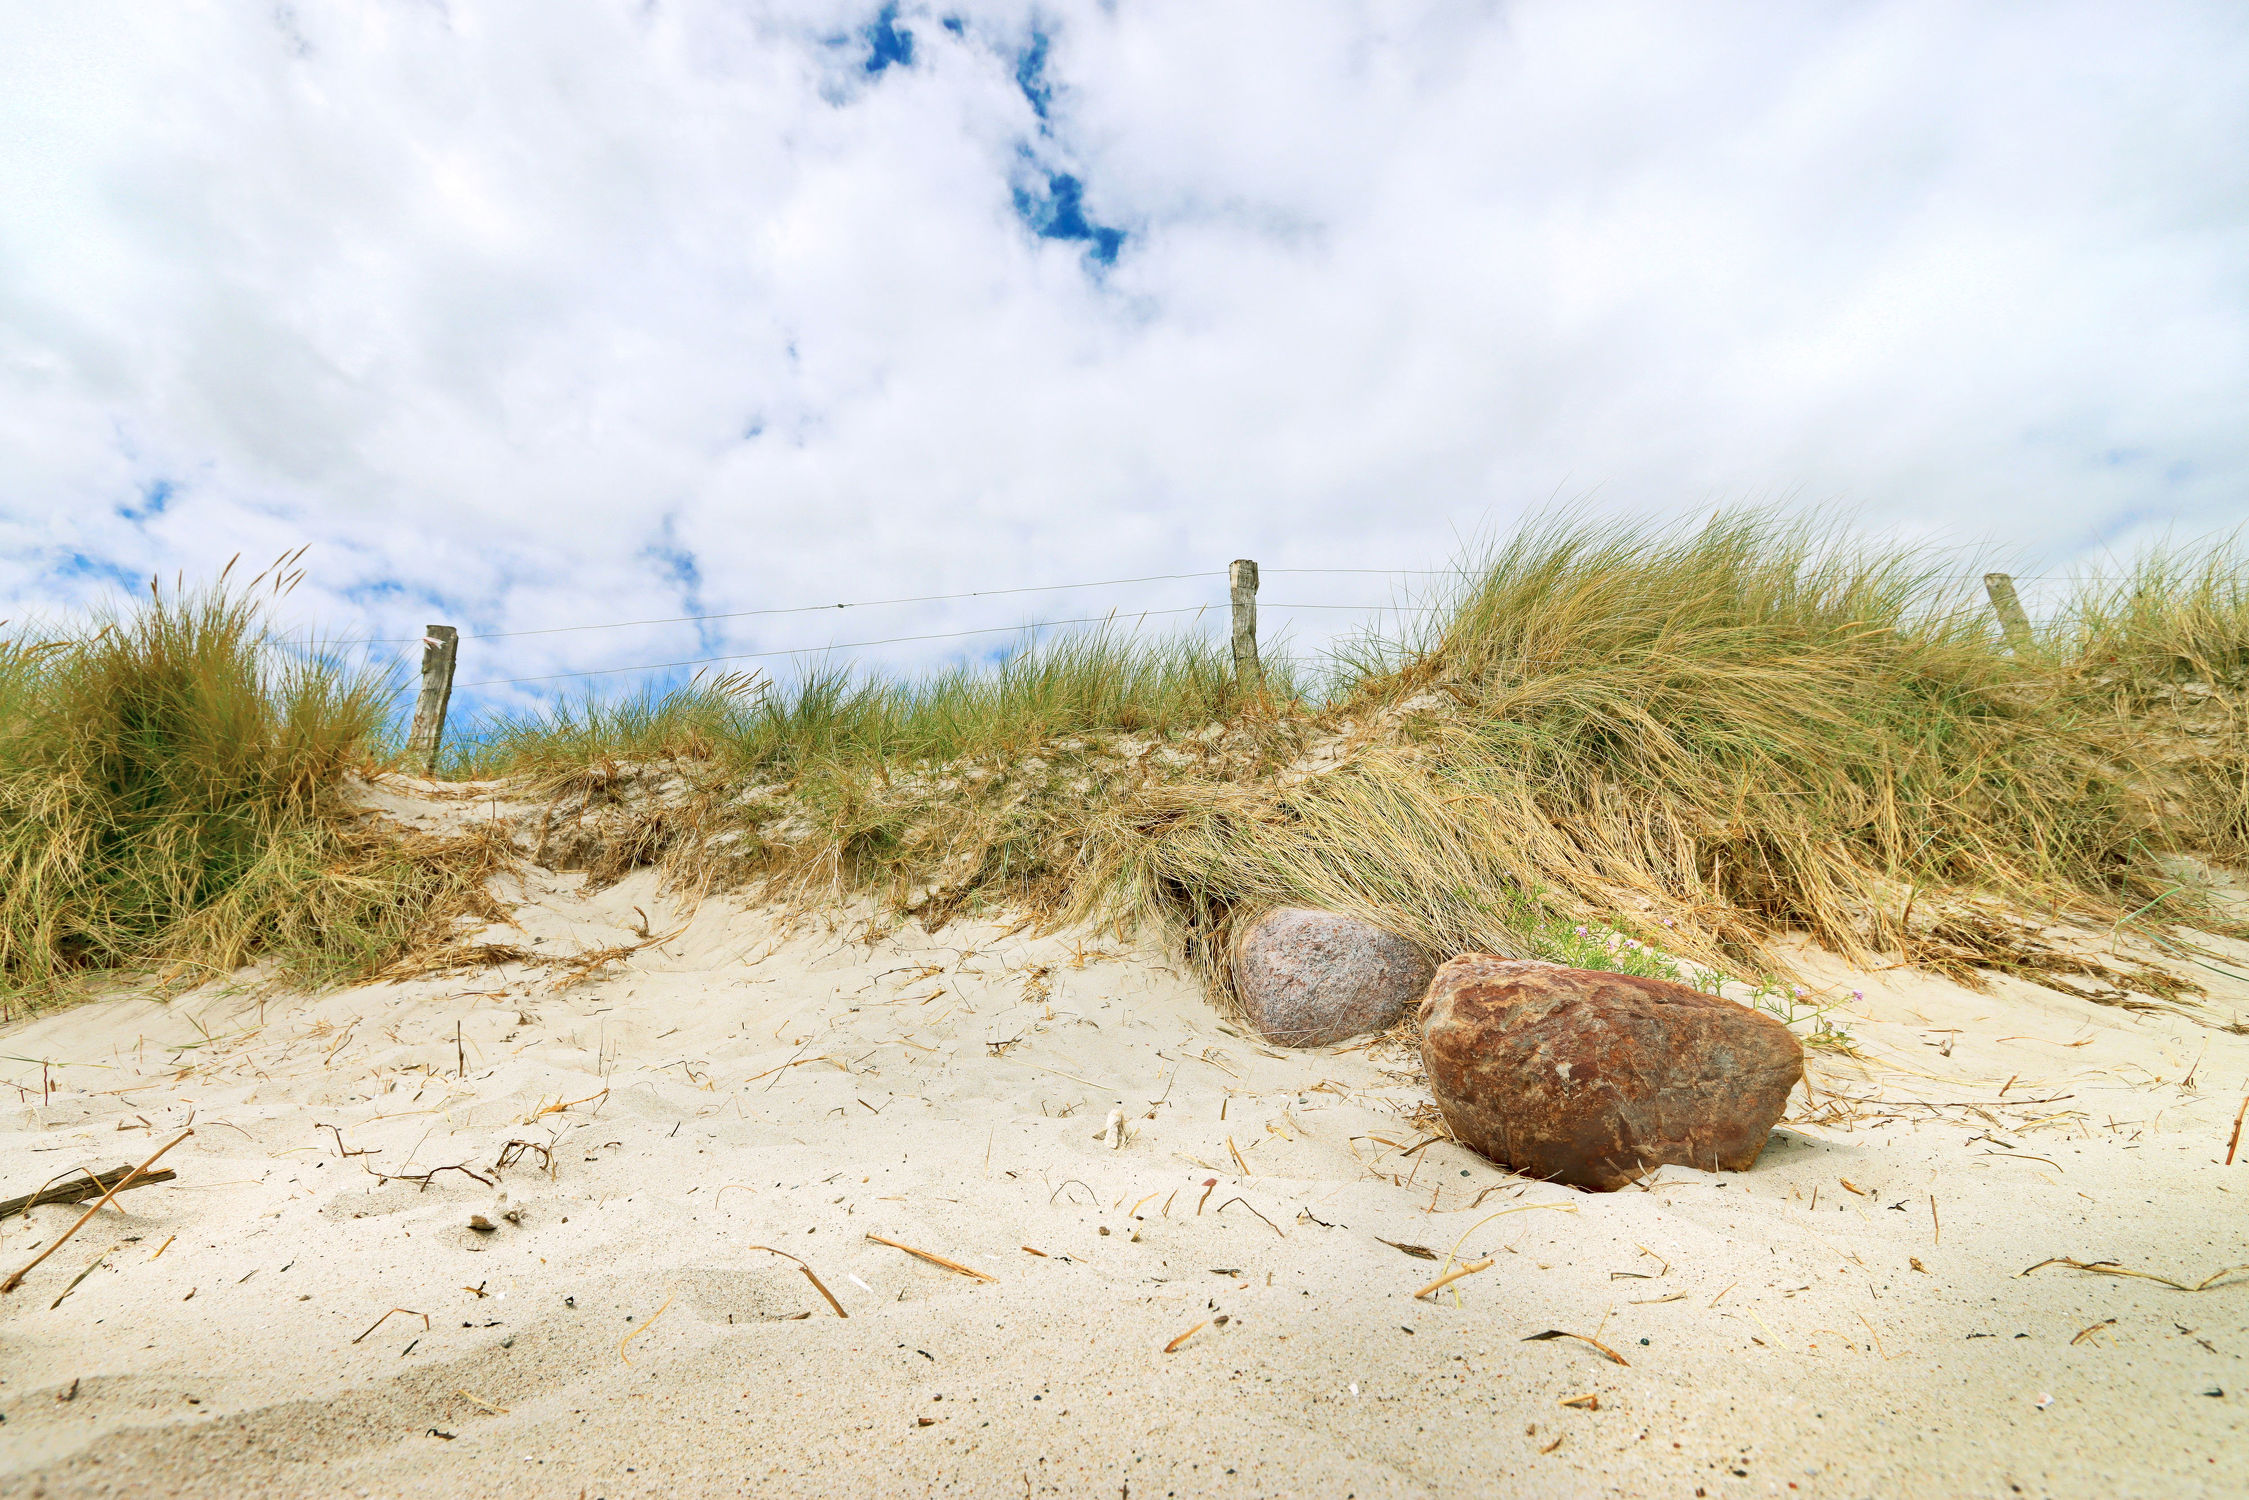 Bild mit Sand, Strand, Sandstrand, Ostsee, Grömitz, Meer, Düne, Dünen, Gras, Dünengras, Nordsee, Am Meer, Strandhafer, Strandgras, Schleswig, Holstein, Ostholstein, Strandgräser